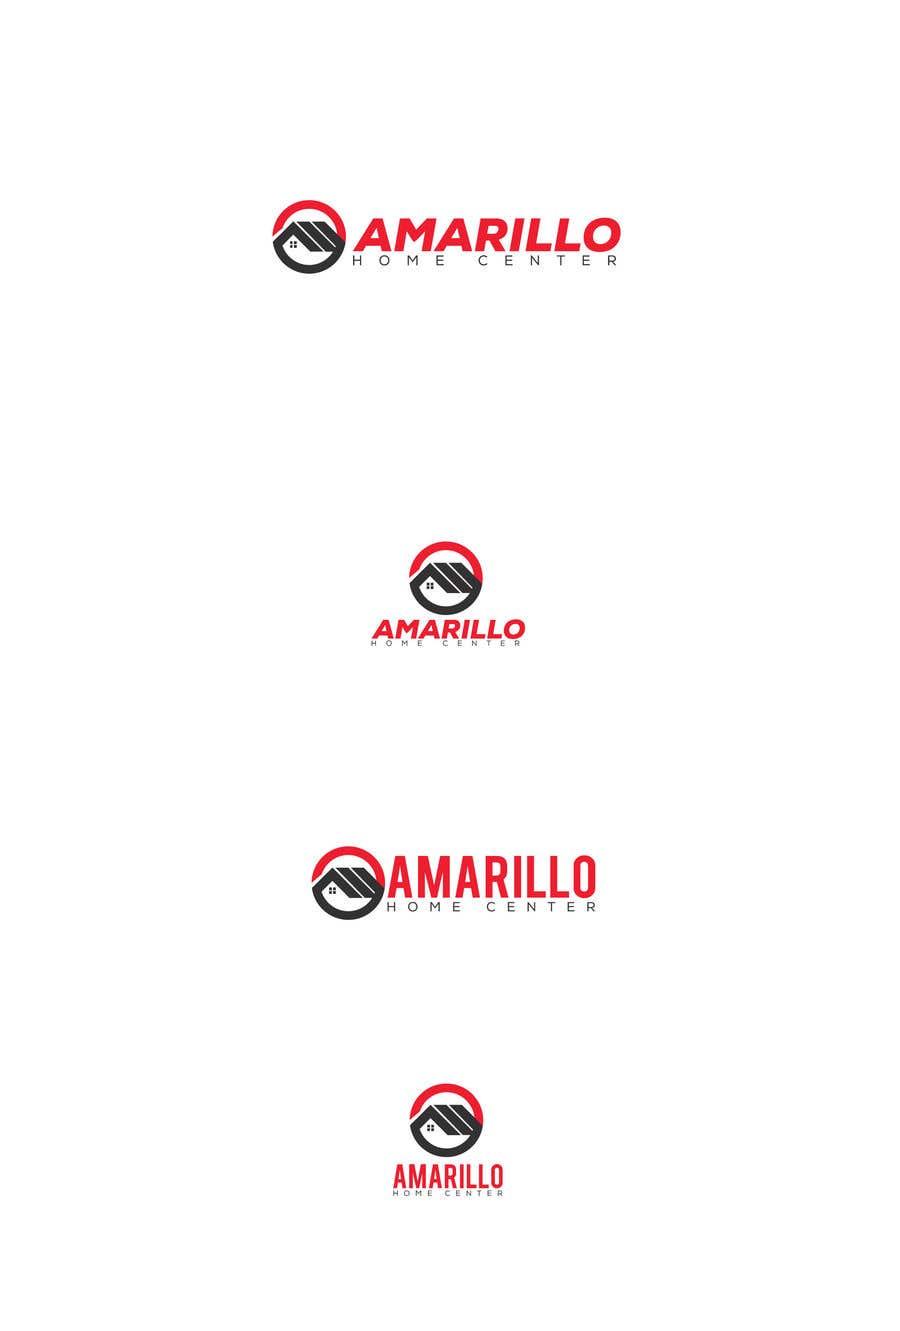 Kilpailutyö #24 kilpailussa Logo Design for Amarillo Home Center